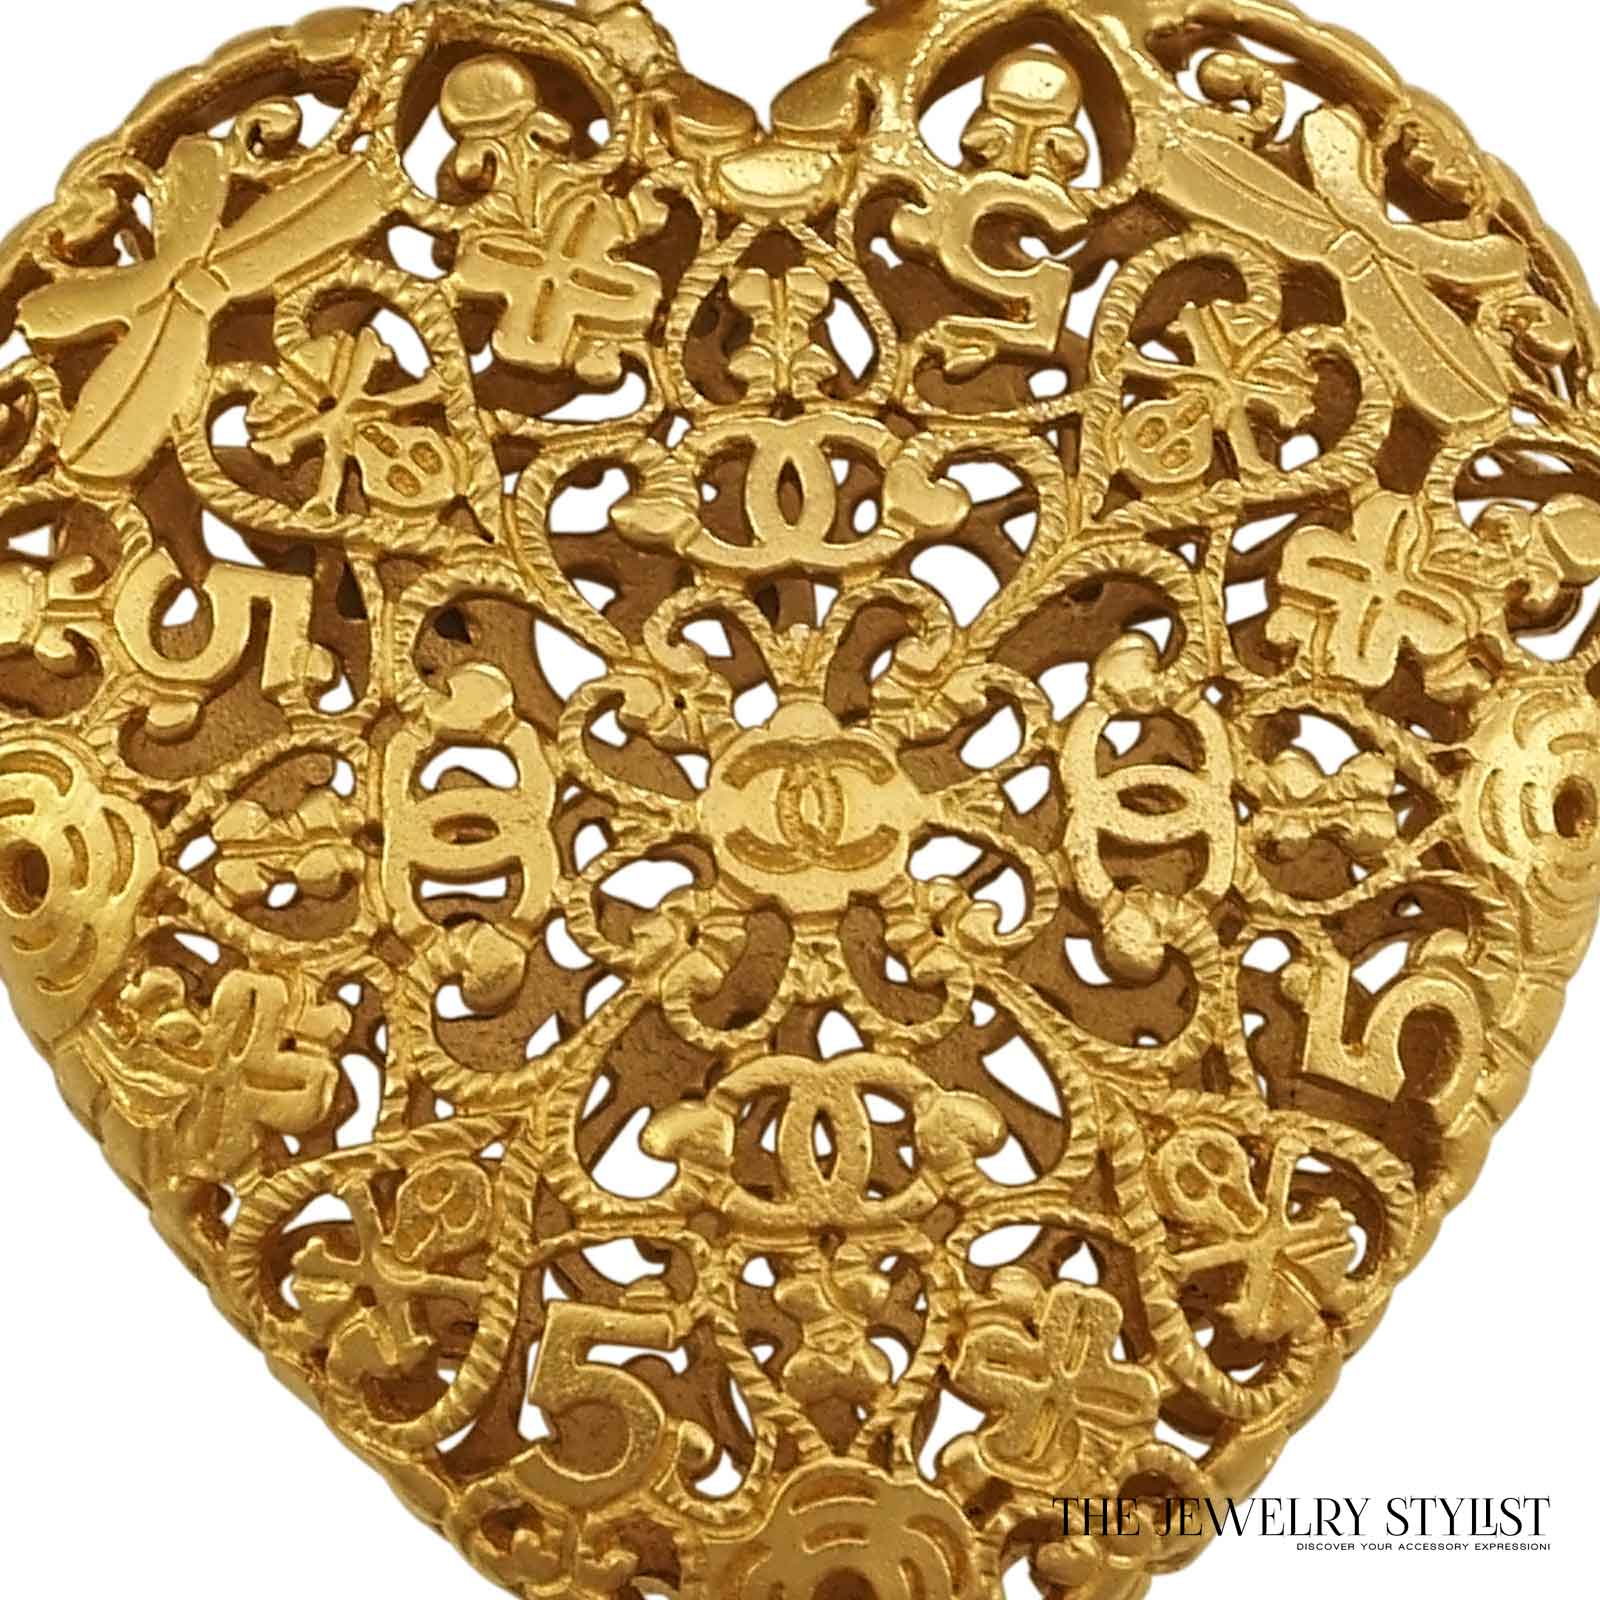 Vintage chanel heart pendant necklace - Vintage chanel ...